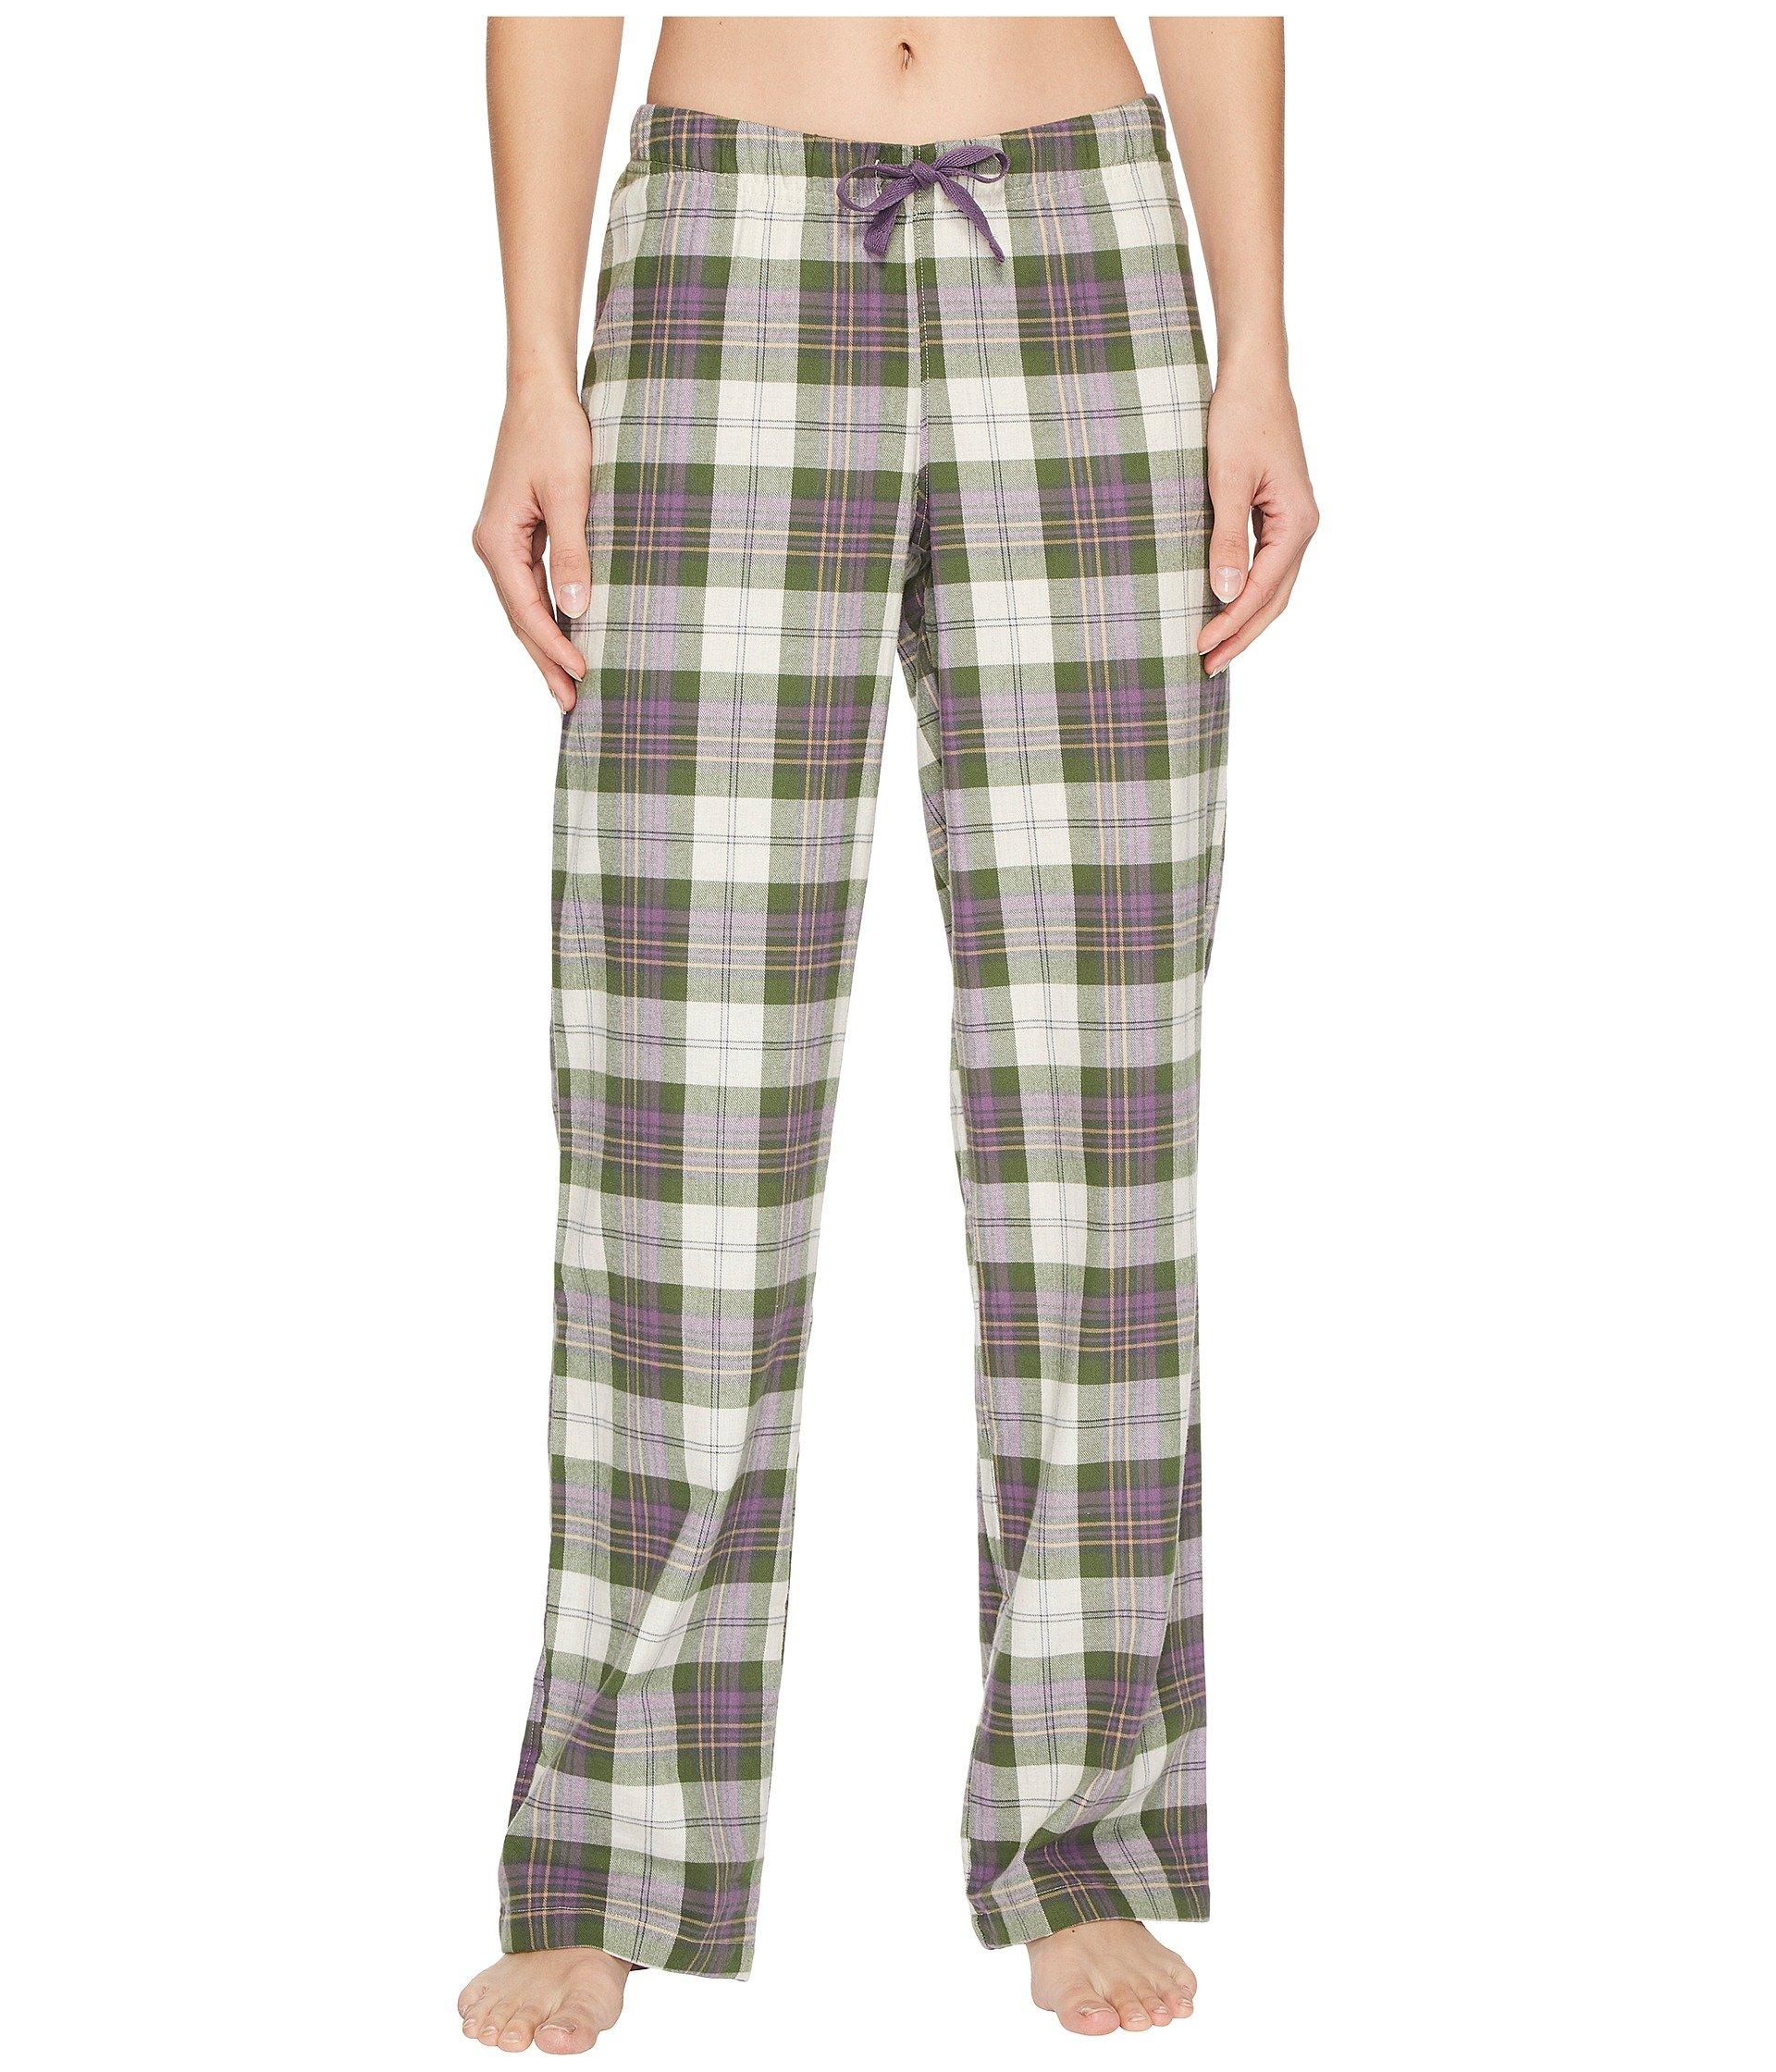 Pantalón de Pijama para Mujer Toadandamp;Co Shuteye Pants  + Toad&Co en VeoyCompro.net